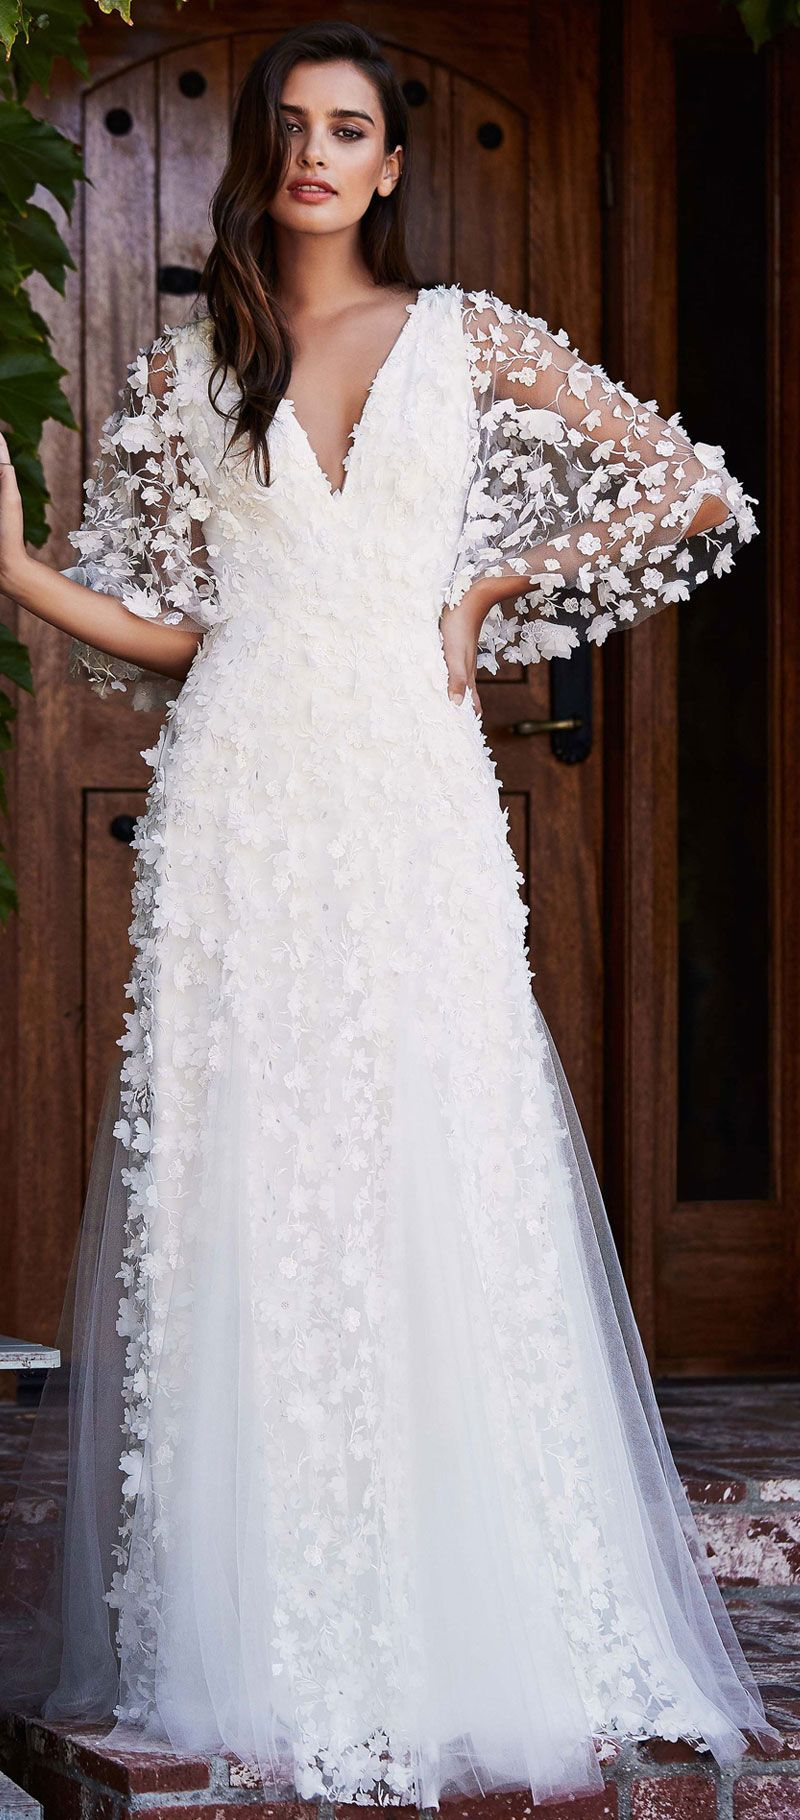 Tadashi Shoji Bridal Fall 2018 Wedding Dress Collection | Pinterest ...